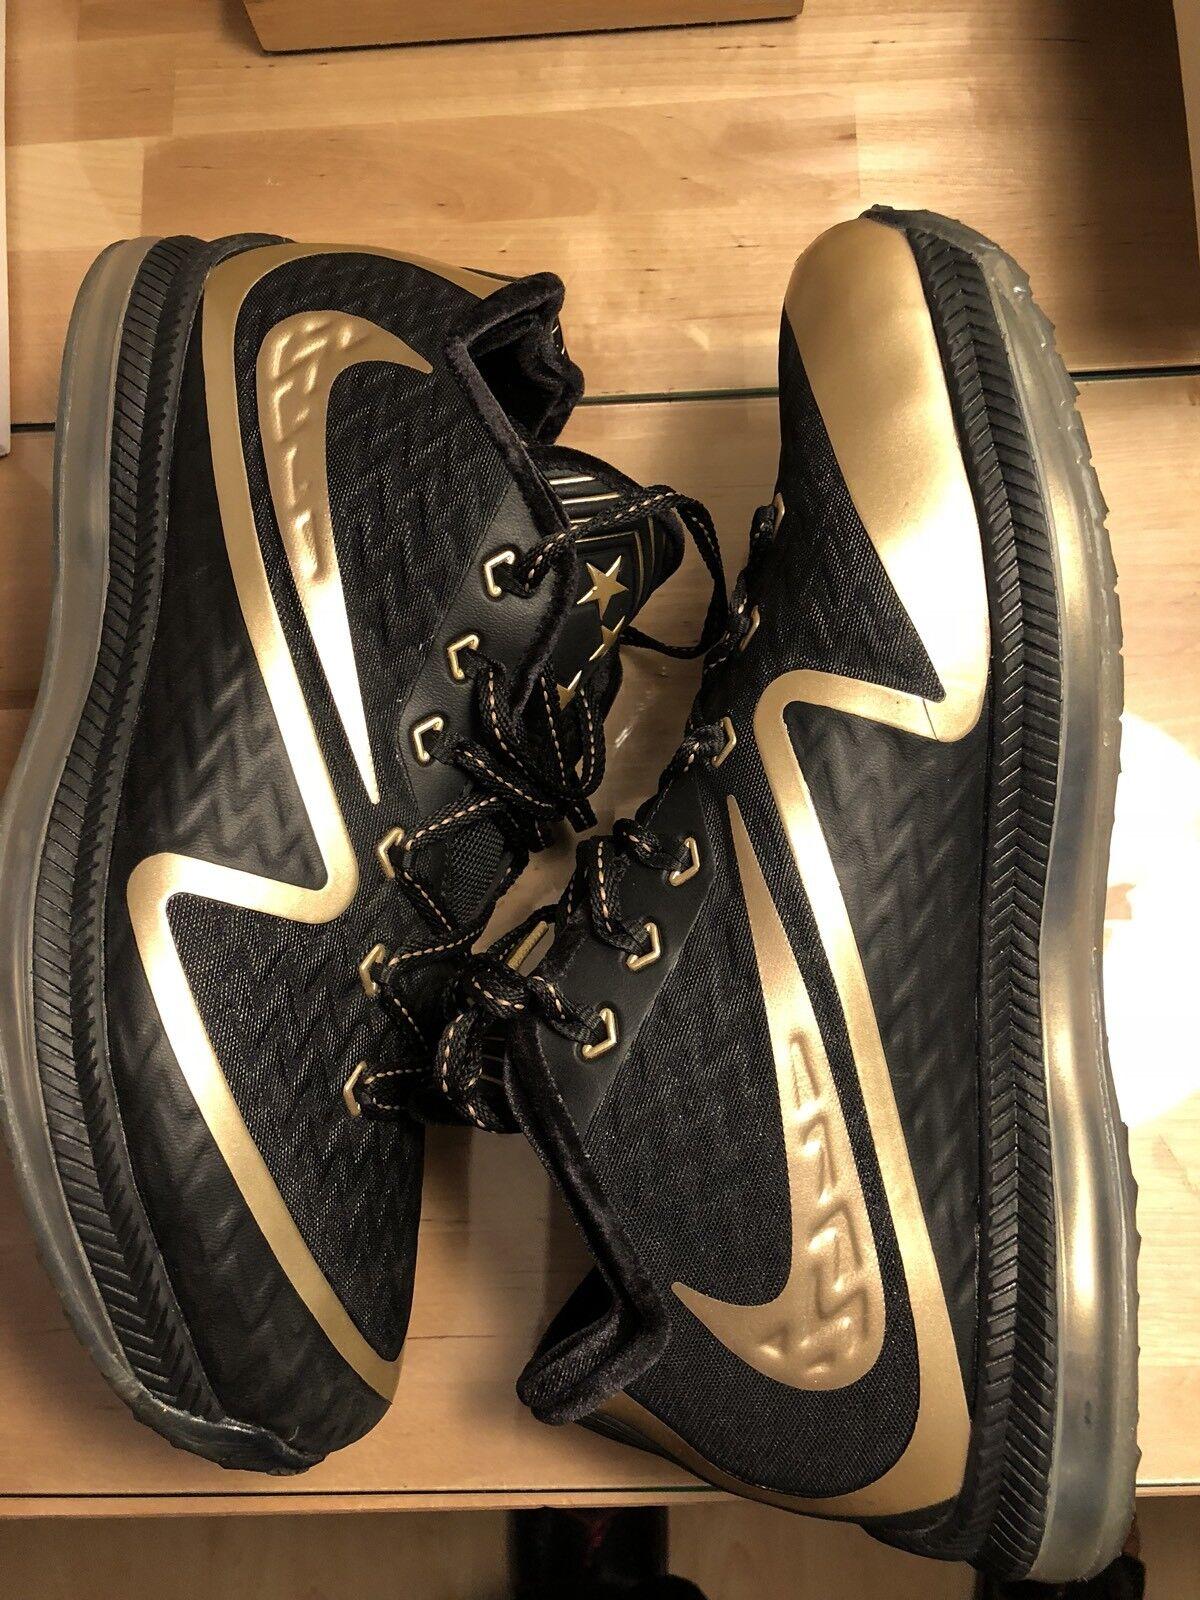 Nike Field General 2 US 10. Rare New 749310-108